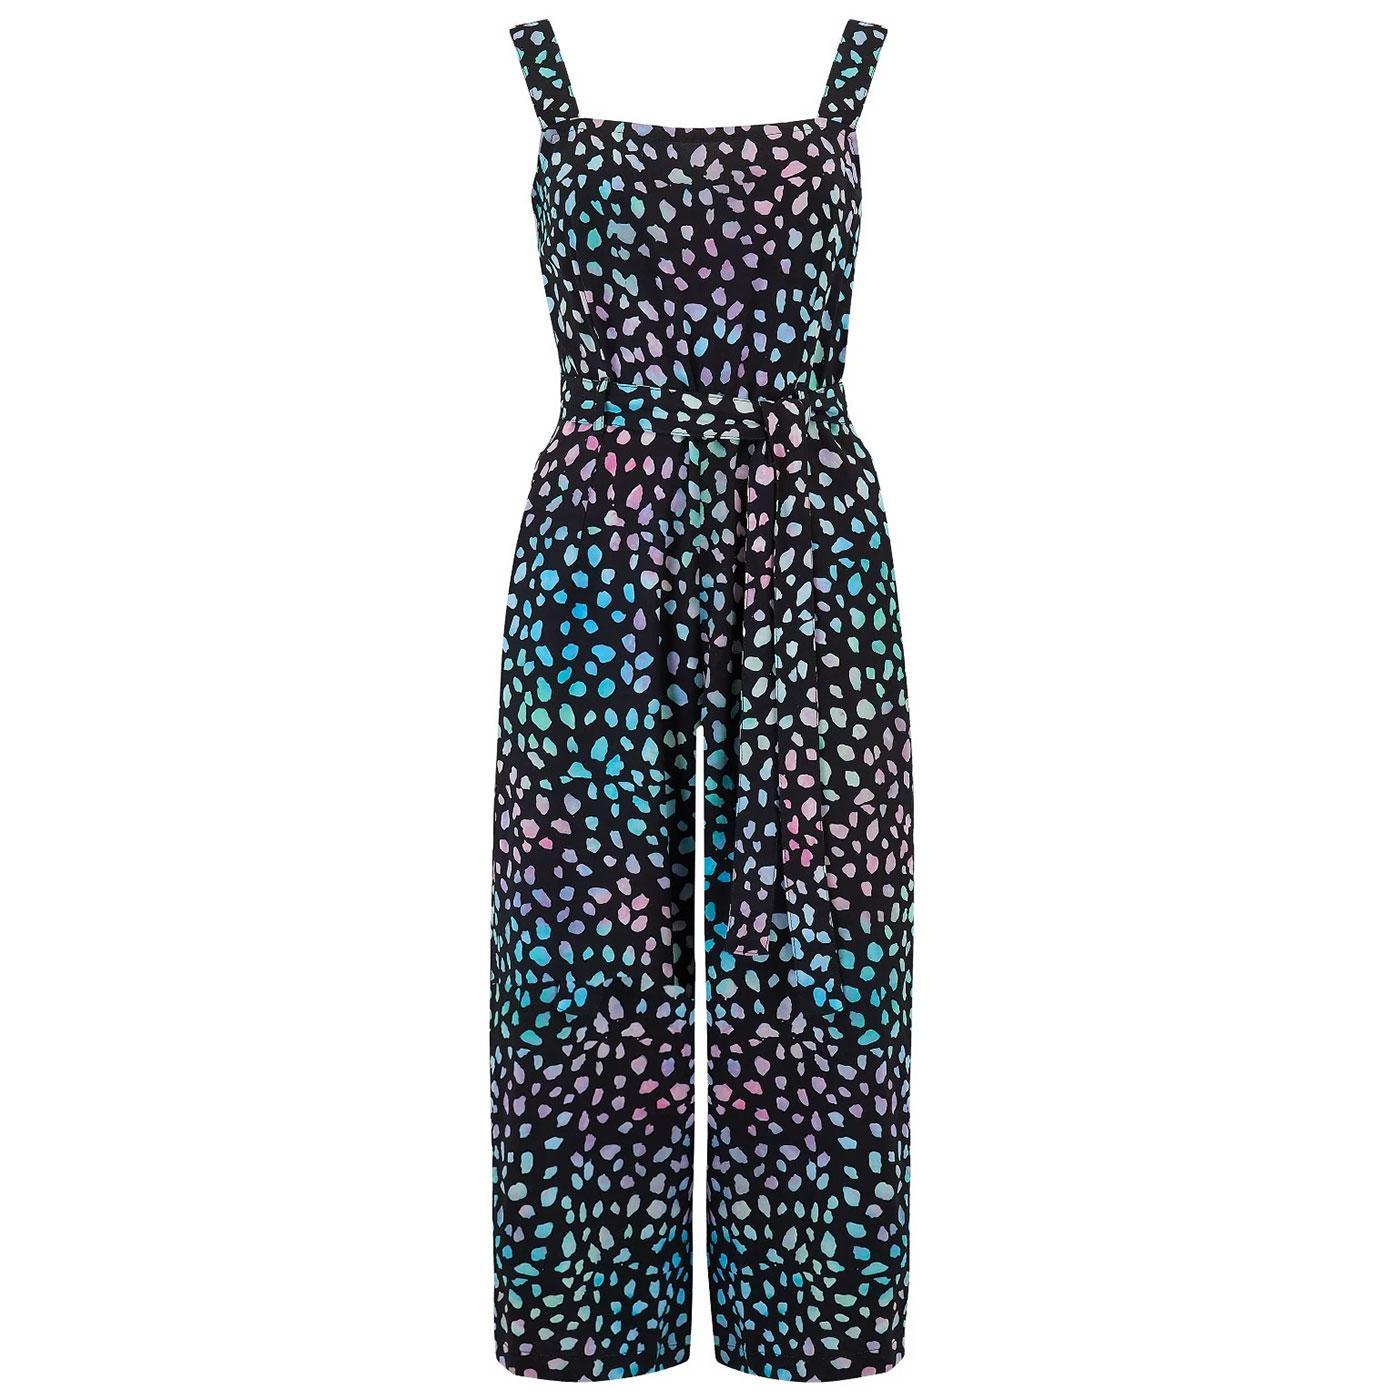 Millie SUGARHILL Painterly Dot Culotte Jumpsuit